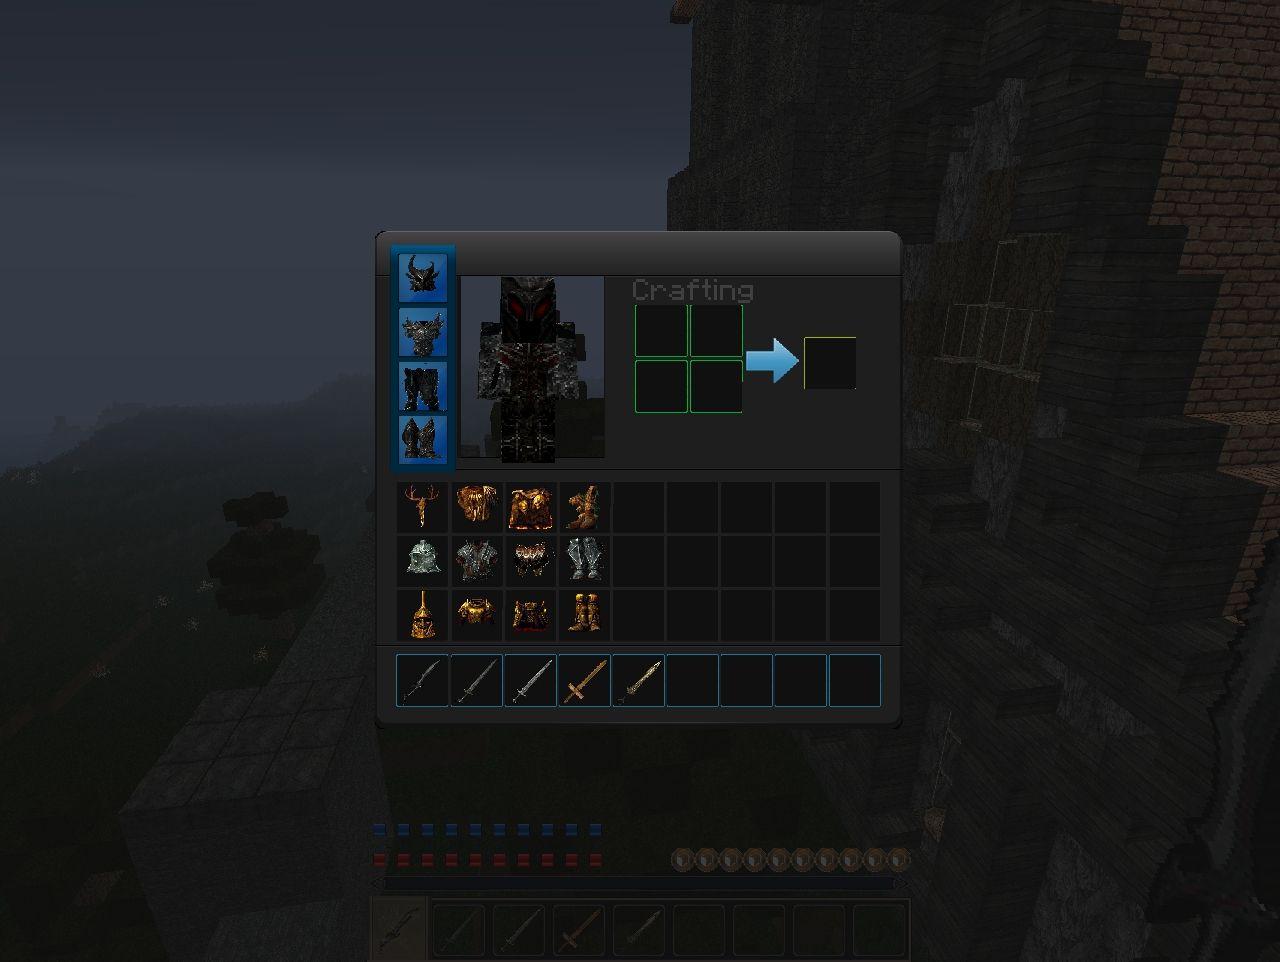 Skyrimcraft-texture-pack-2.jpg